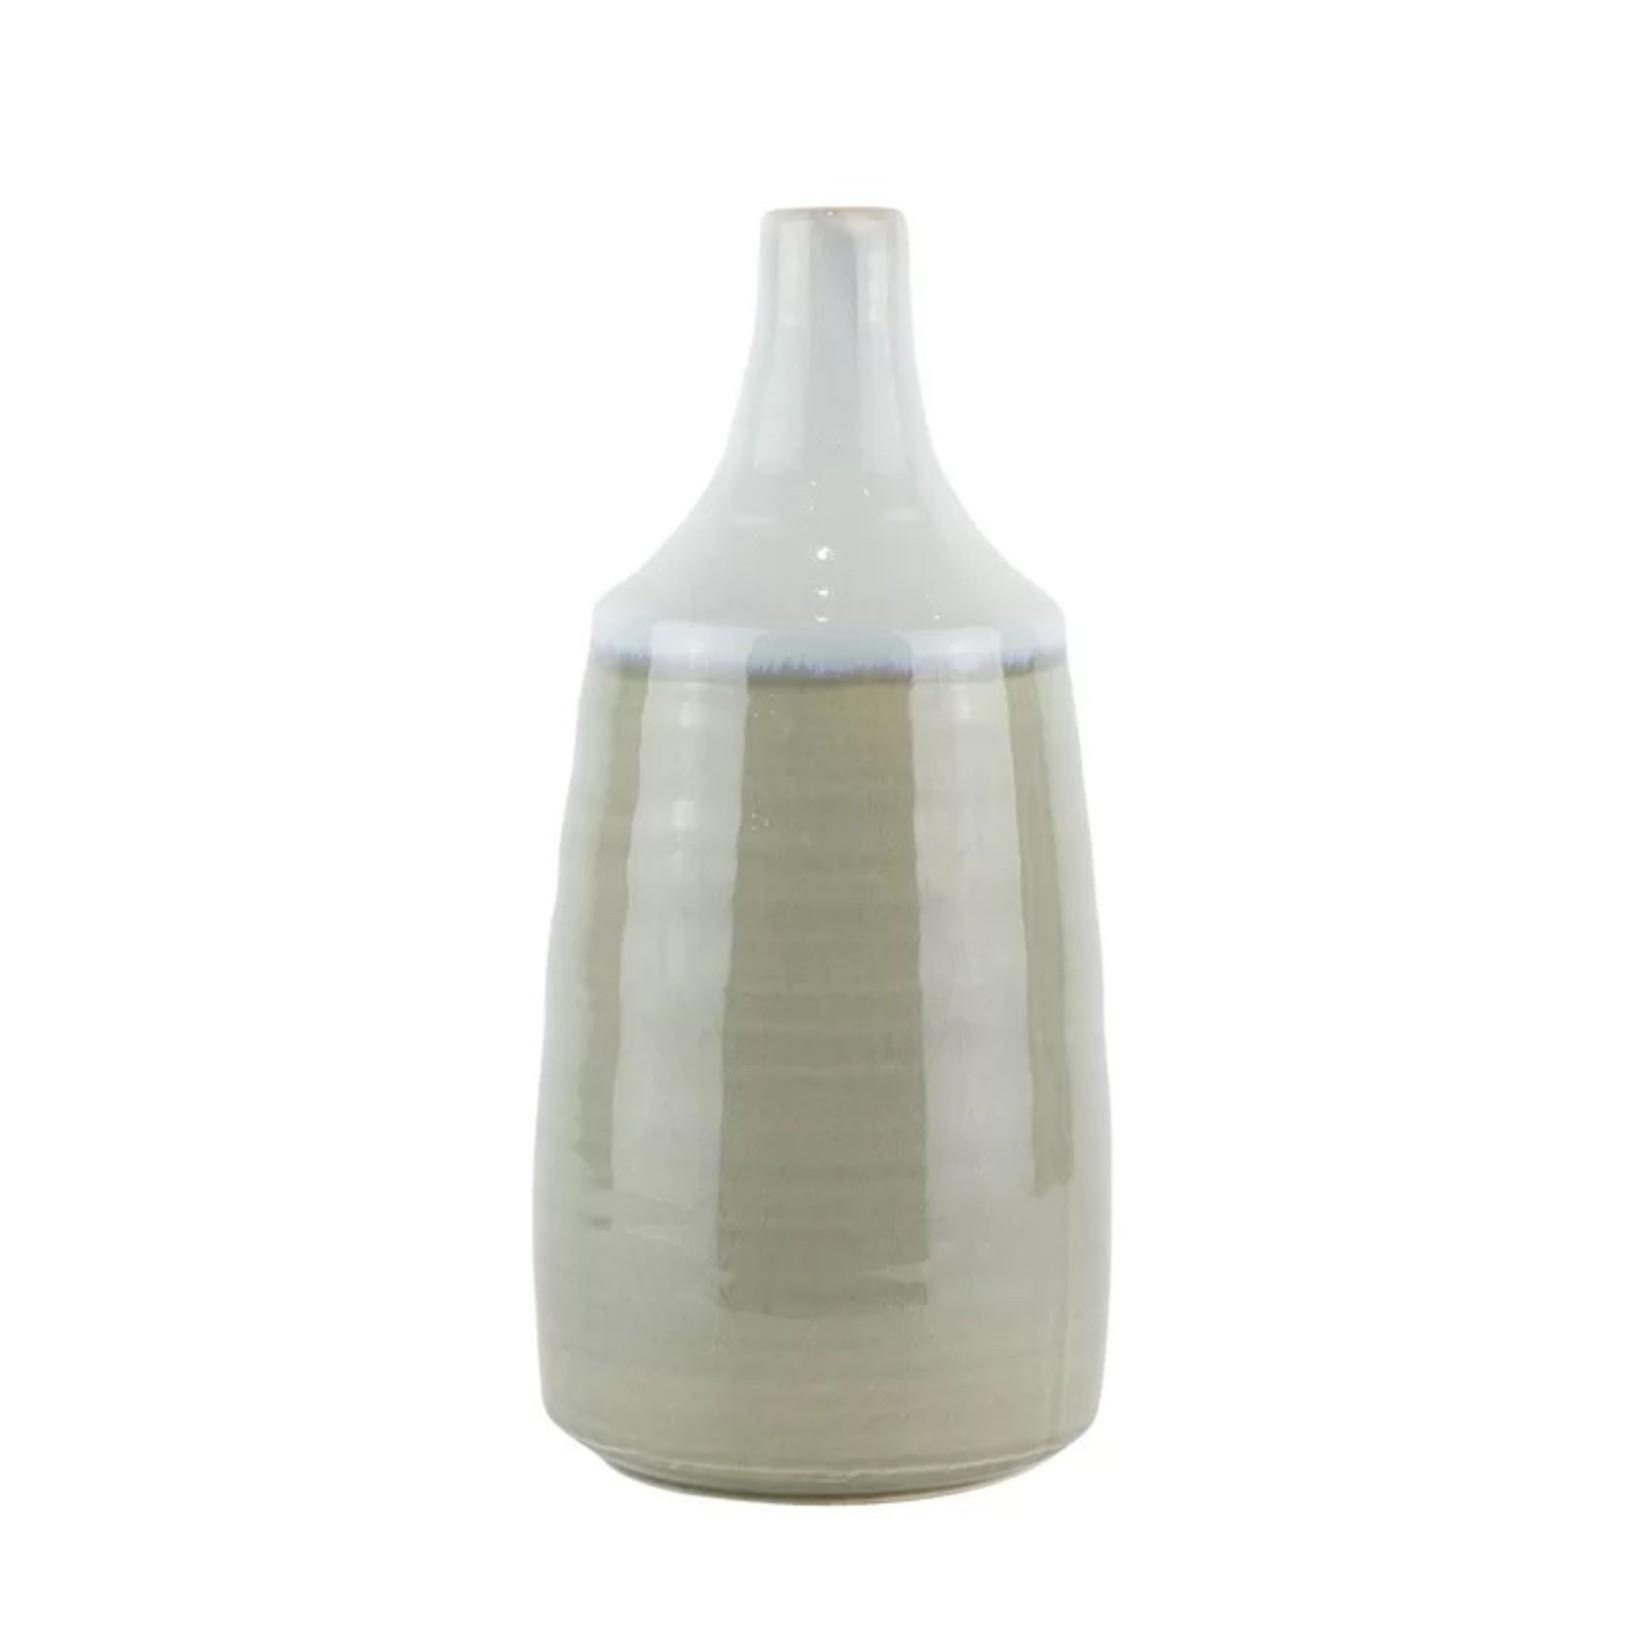 *Rains Ceramic Drip Glaze Table Vase